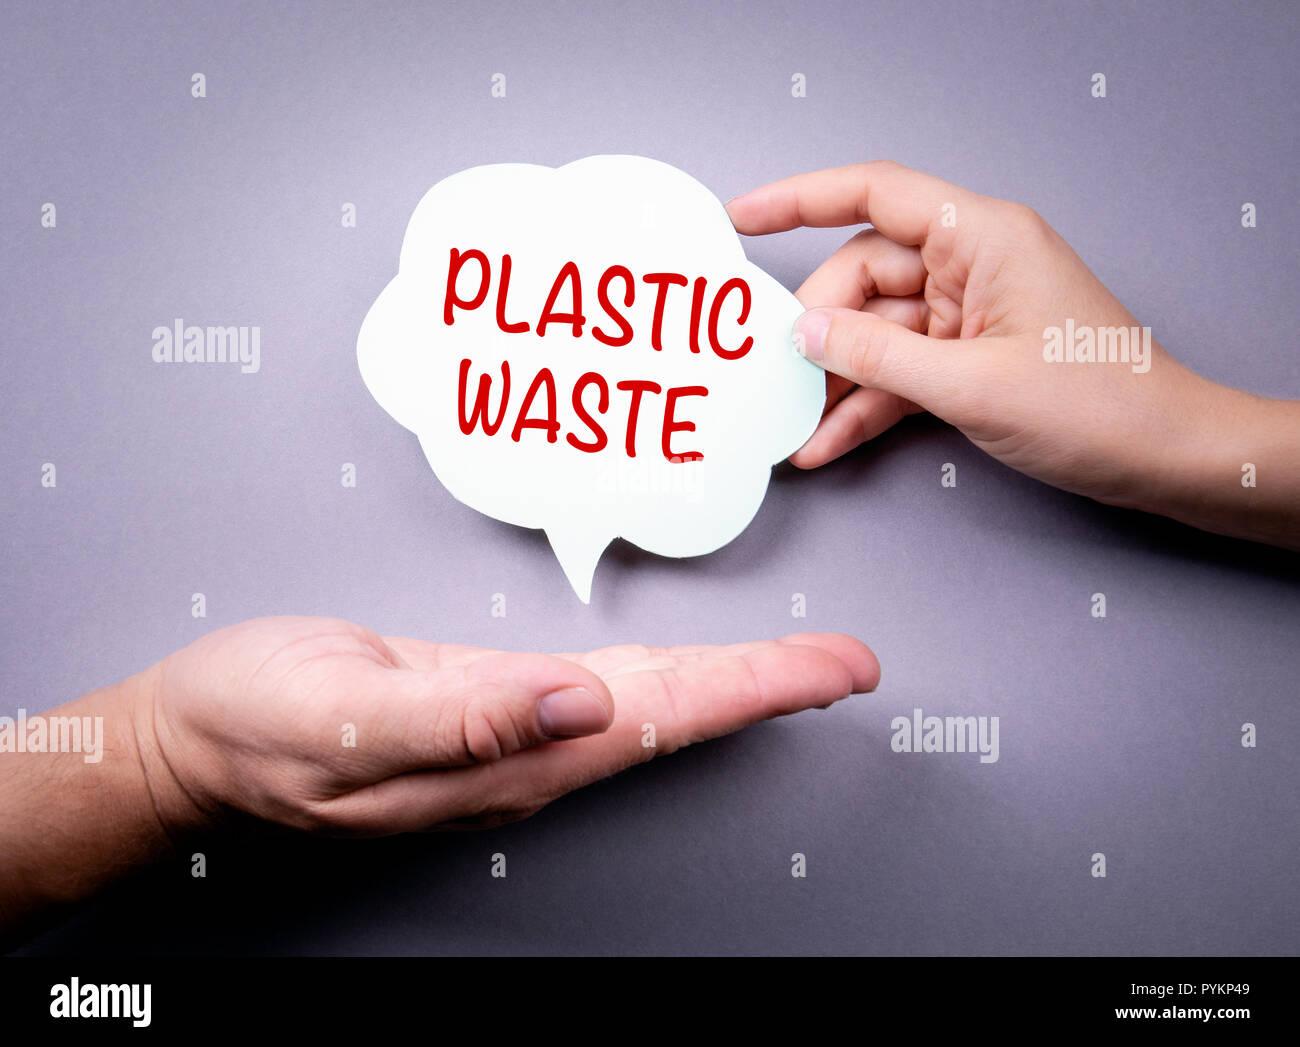 plastic waste concept - Stock Image